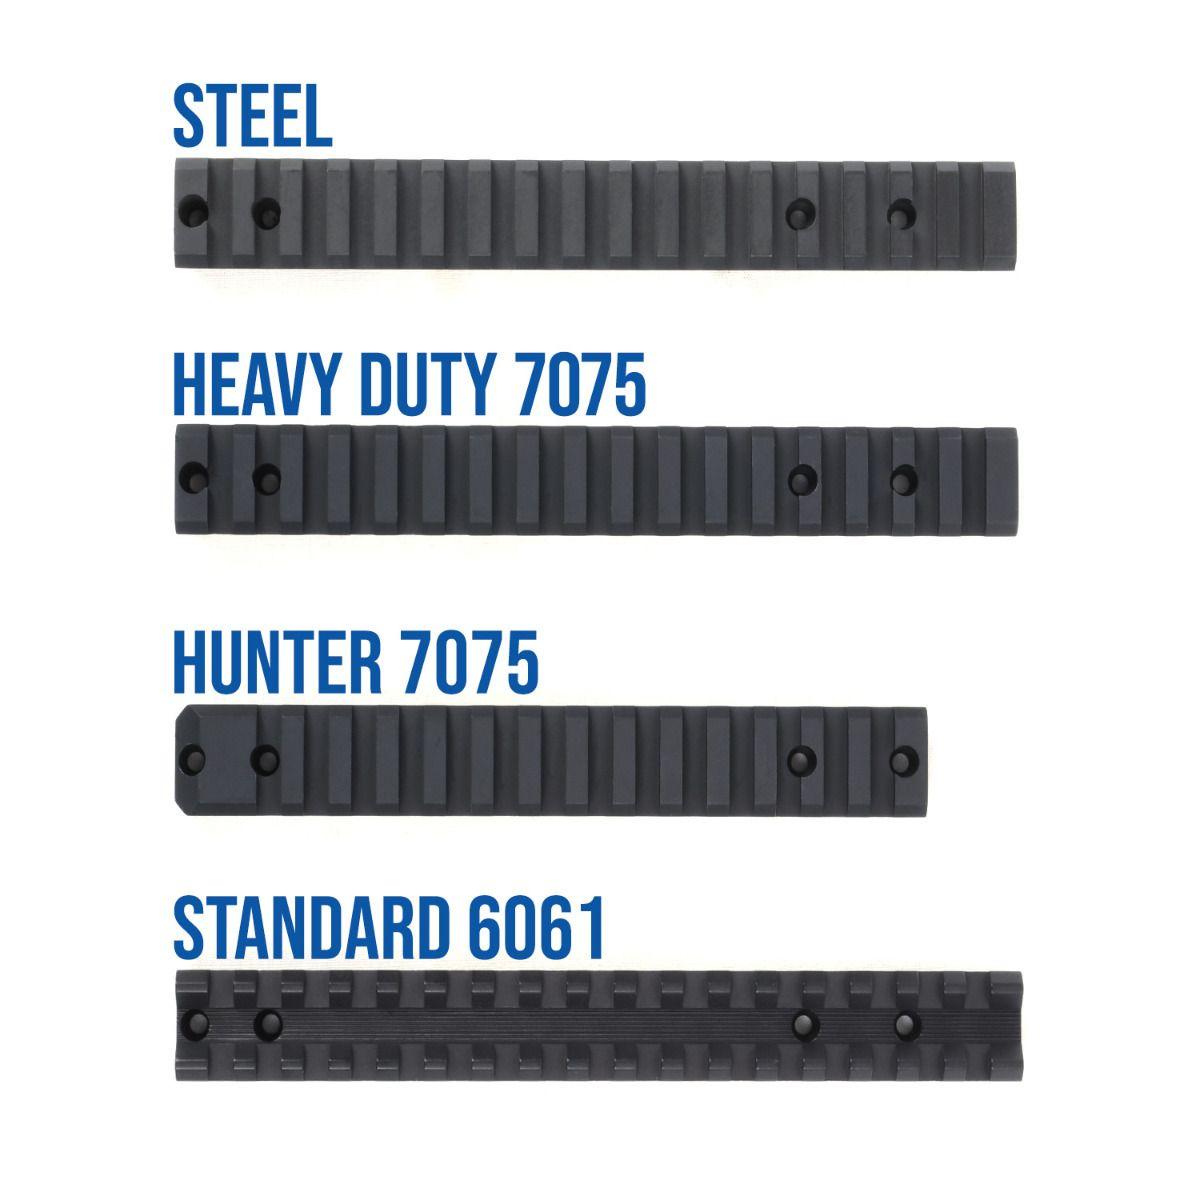 Hunter Series Remington 700, 722, 40x, Ultimate Muzzleloader Short Action Picatinny Rail 20 MOA